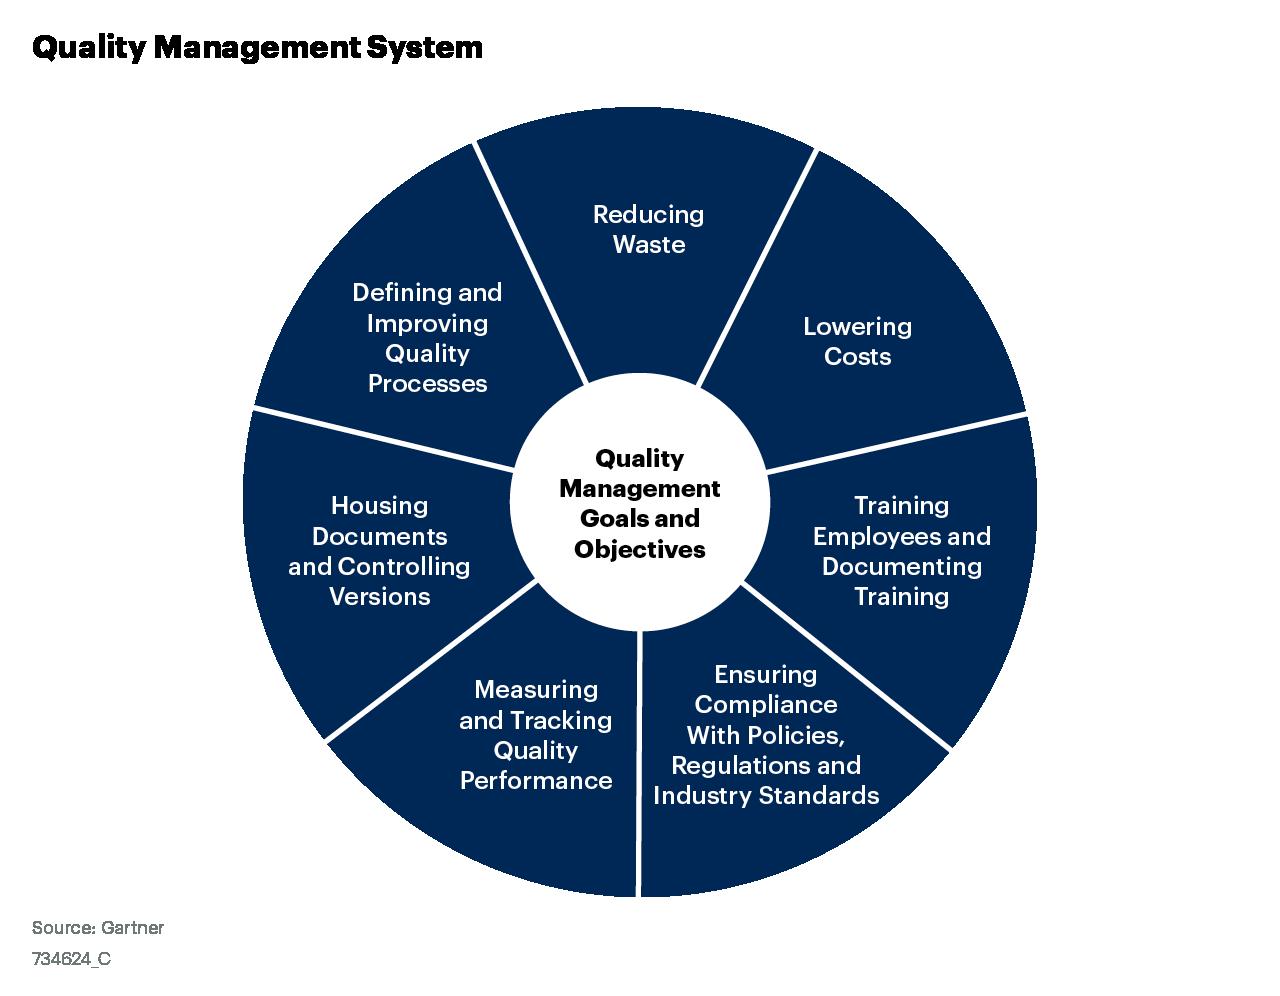 Figure_1_Quality_Management_System